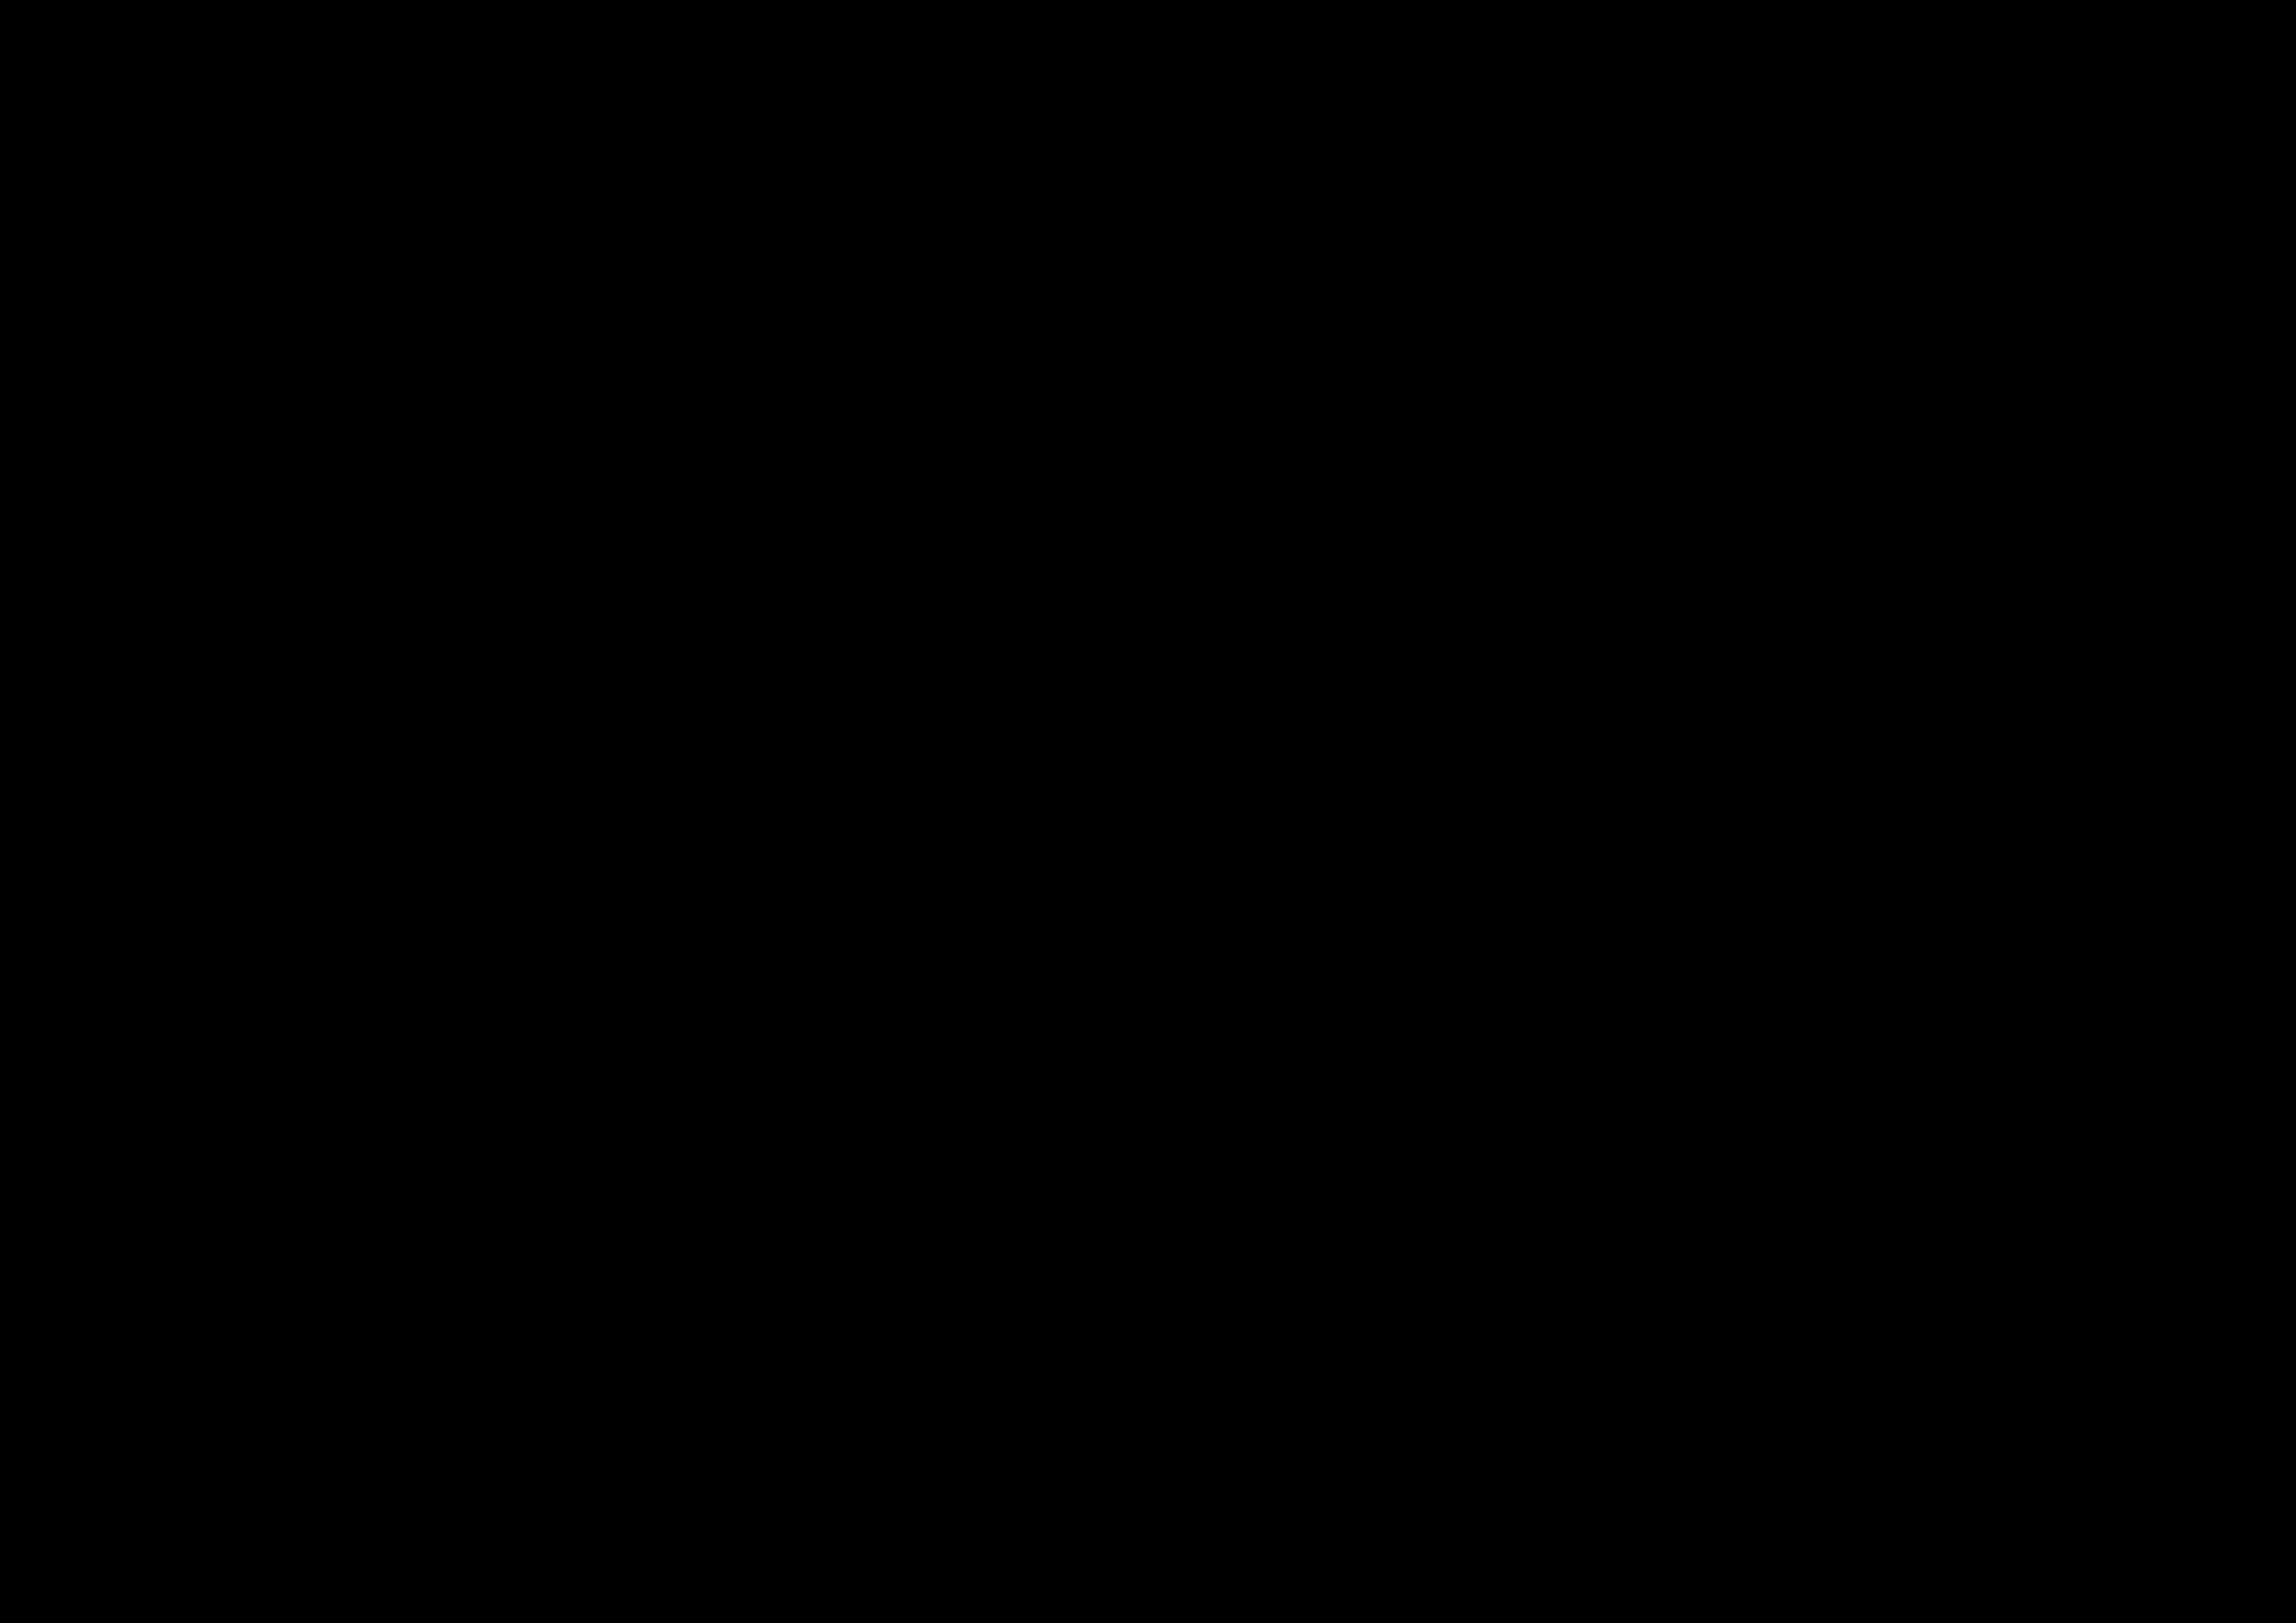 Handle_Bar_Logo_BW-01.png